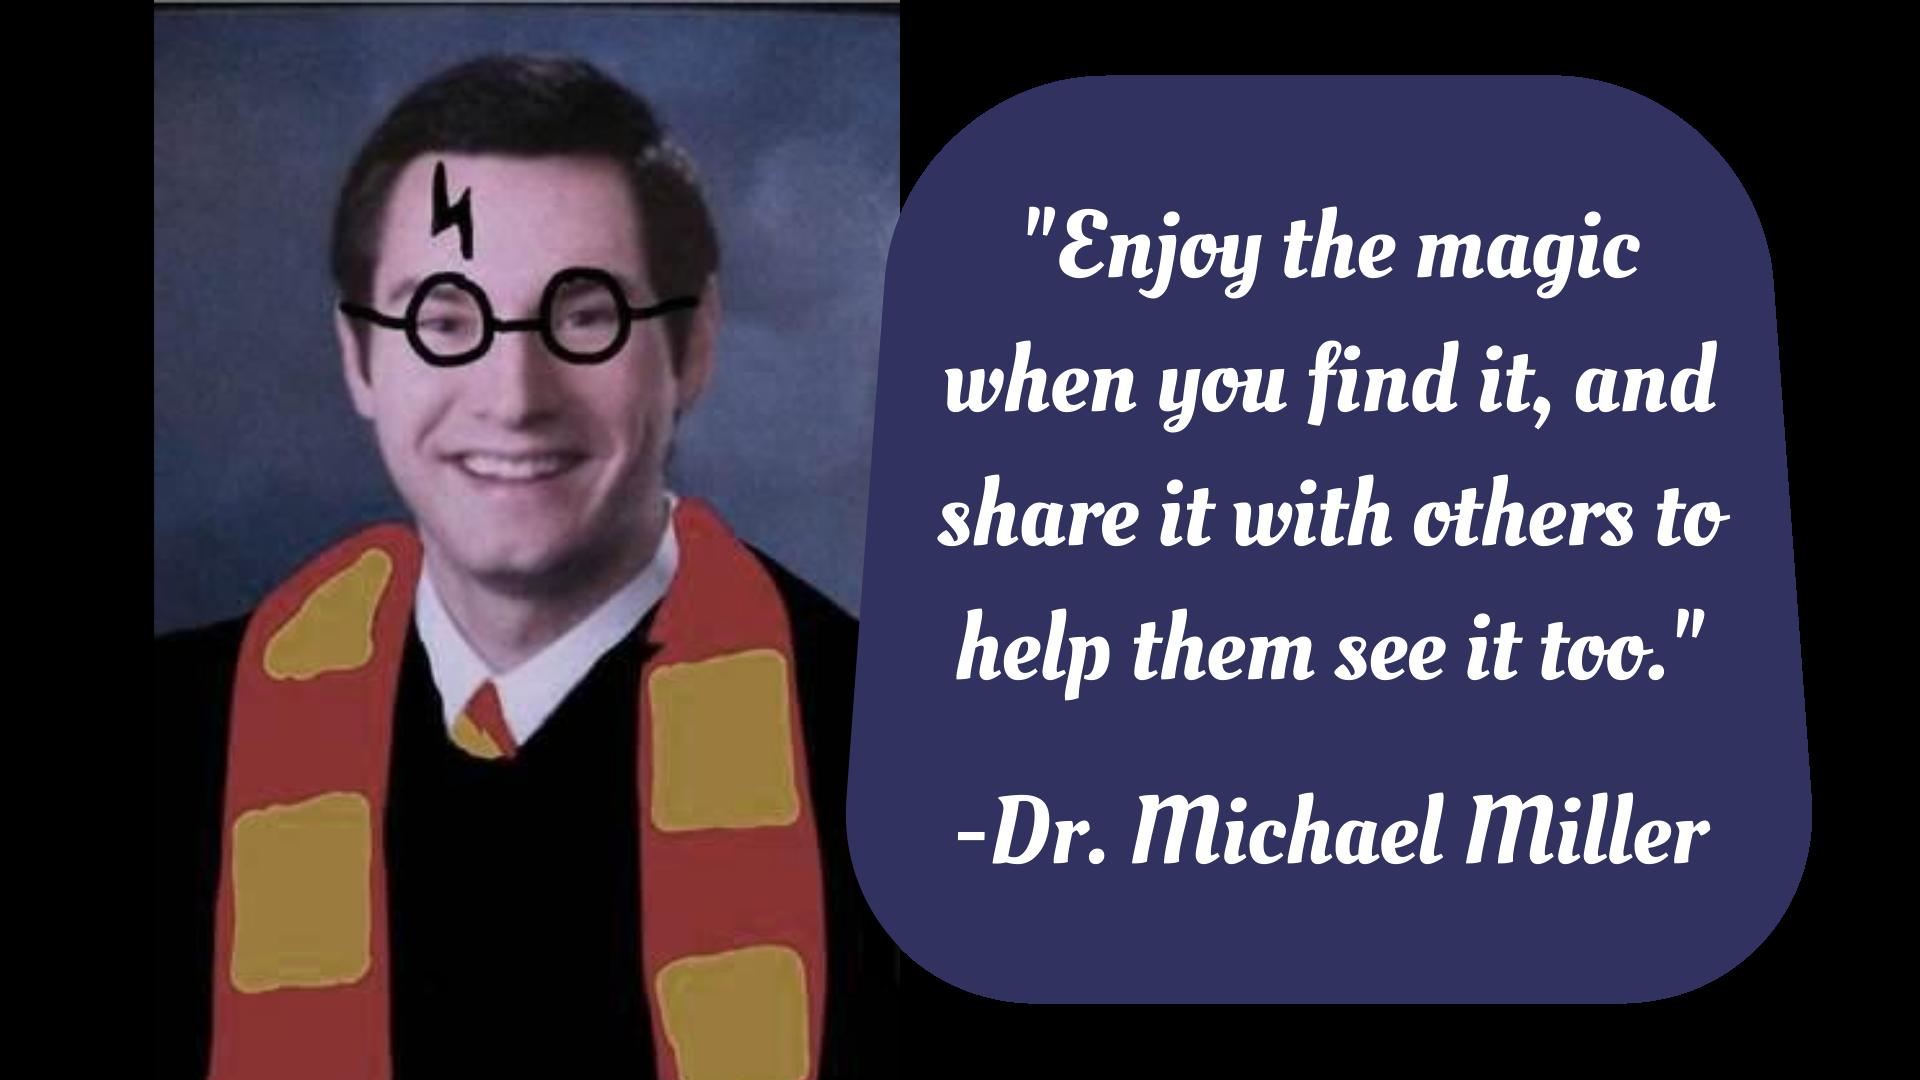 Michael Miller, DVM